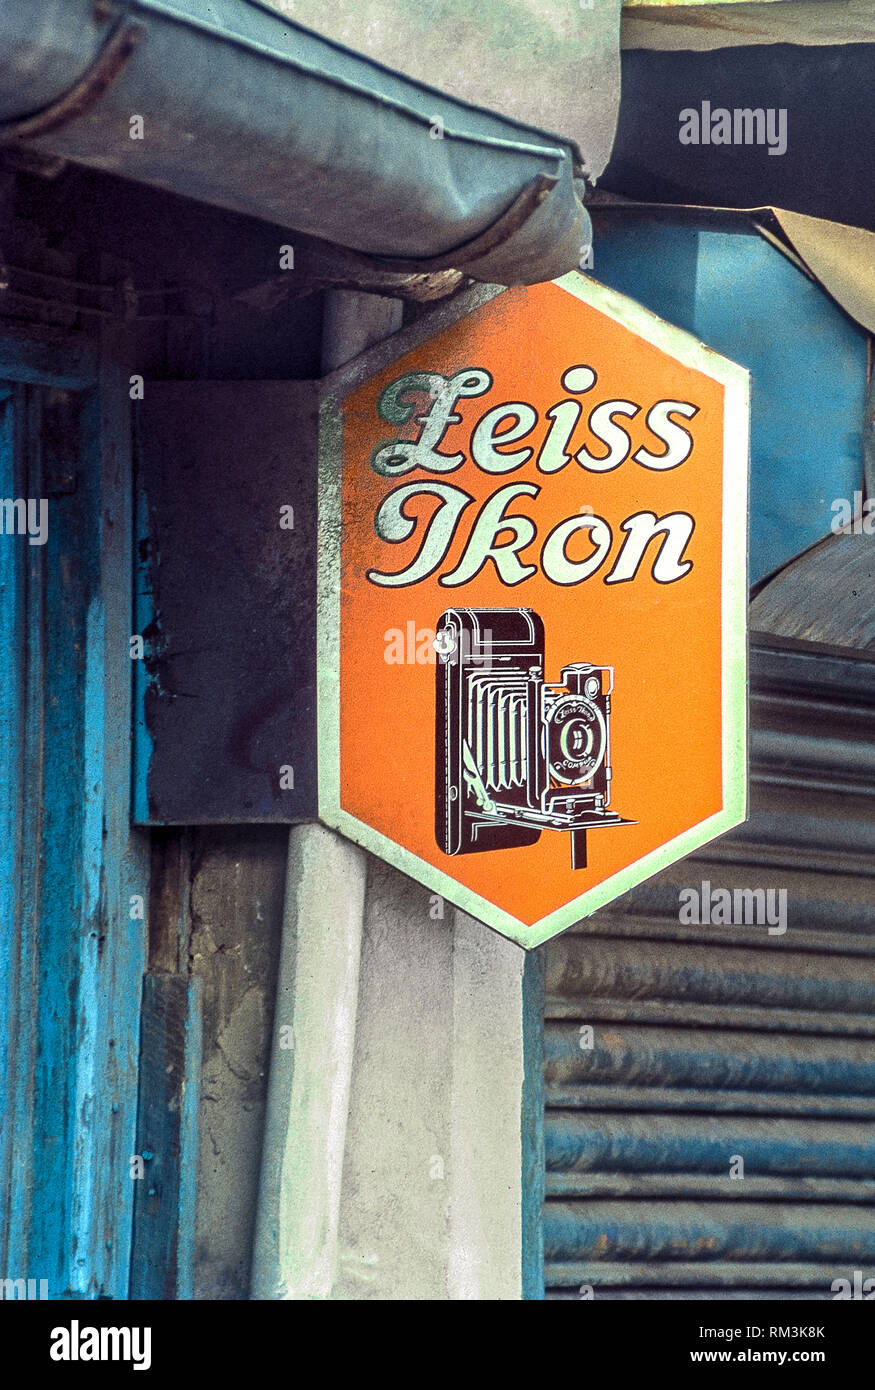 Zeiss Ikon camera vintage vitreous enamel advertising sign board, India, Asia - Stock Image